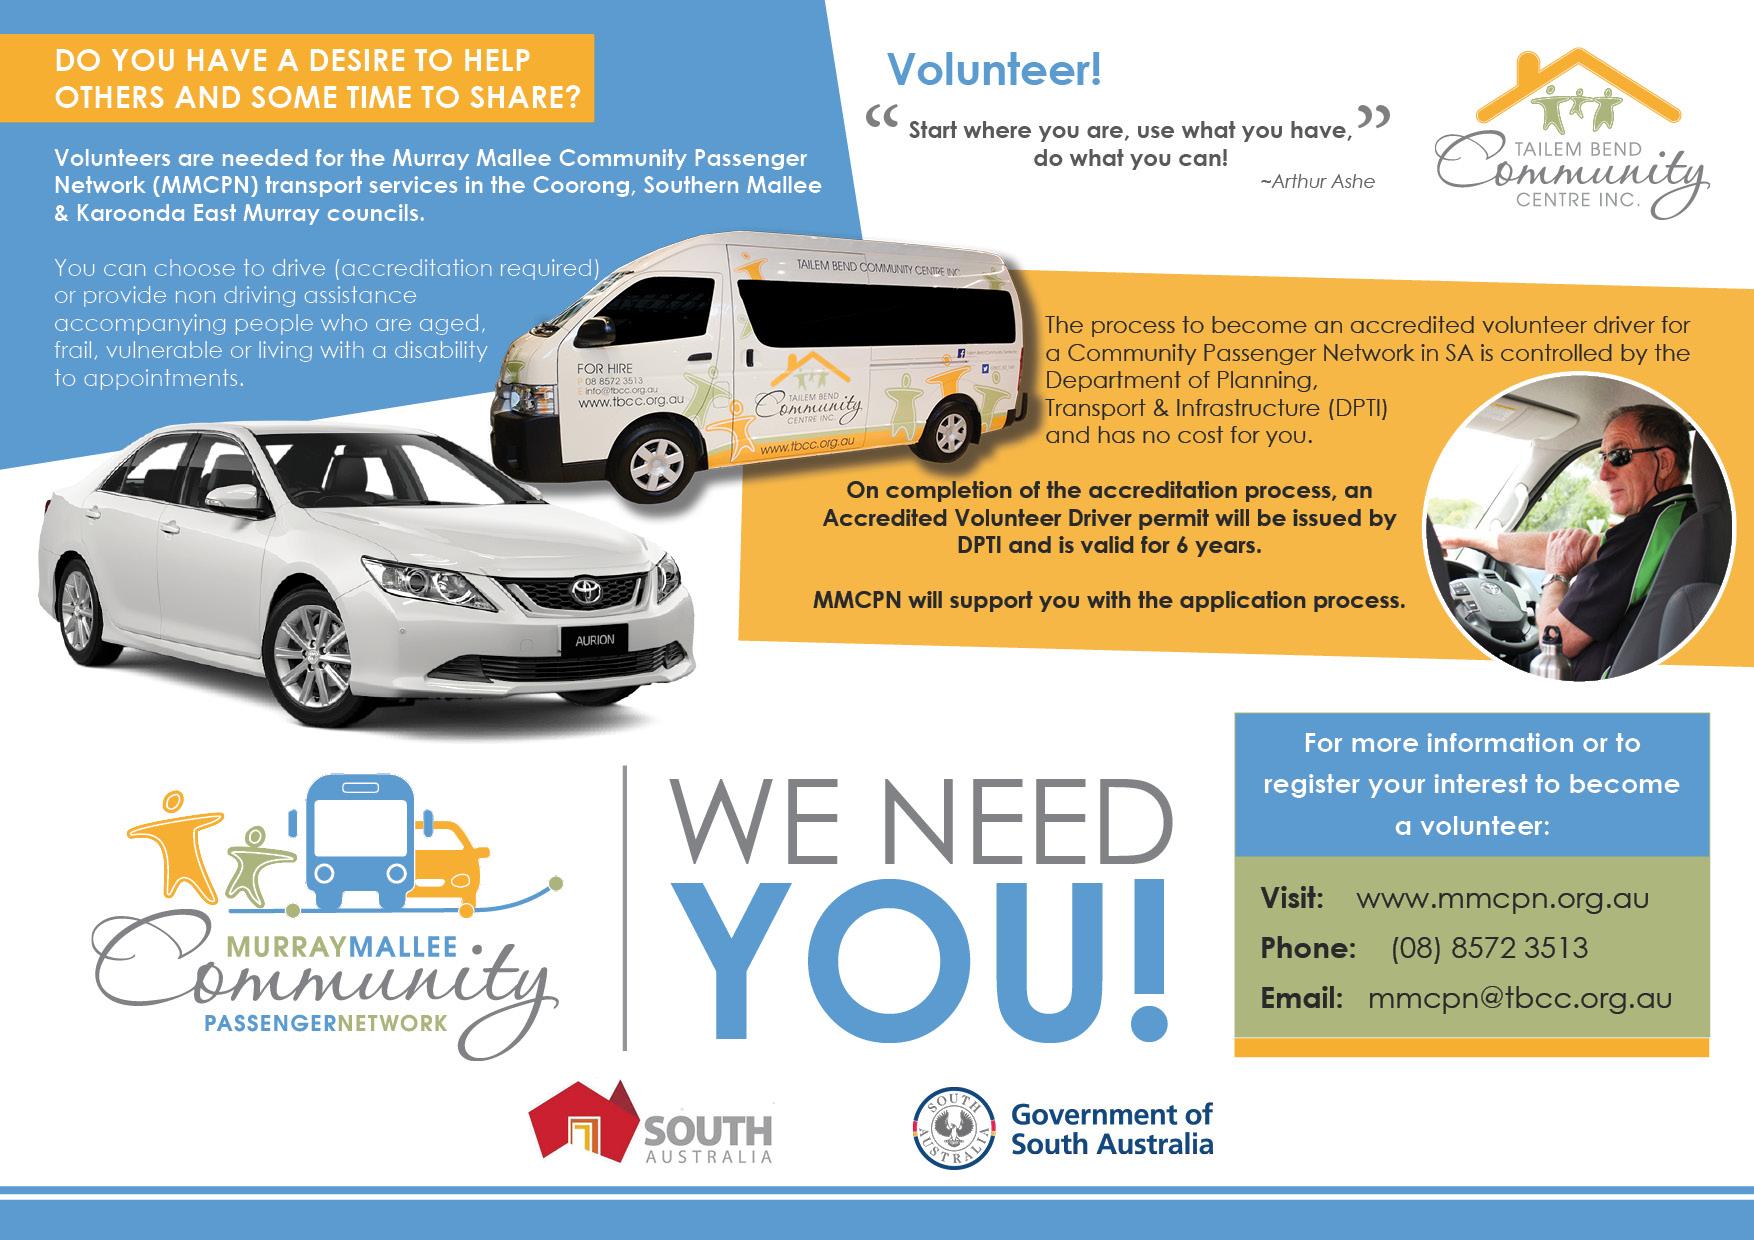 Murray Mallee Community Passenger Network needs volunteer drivers